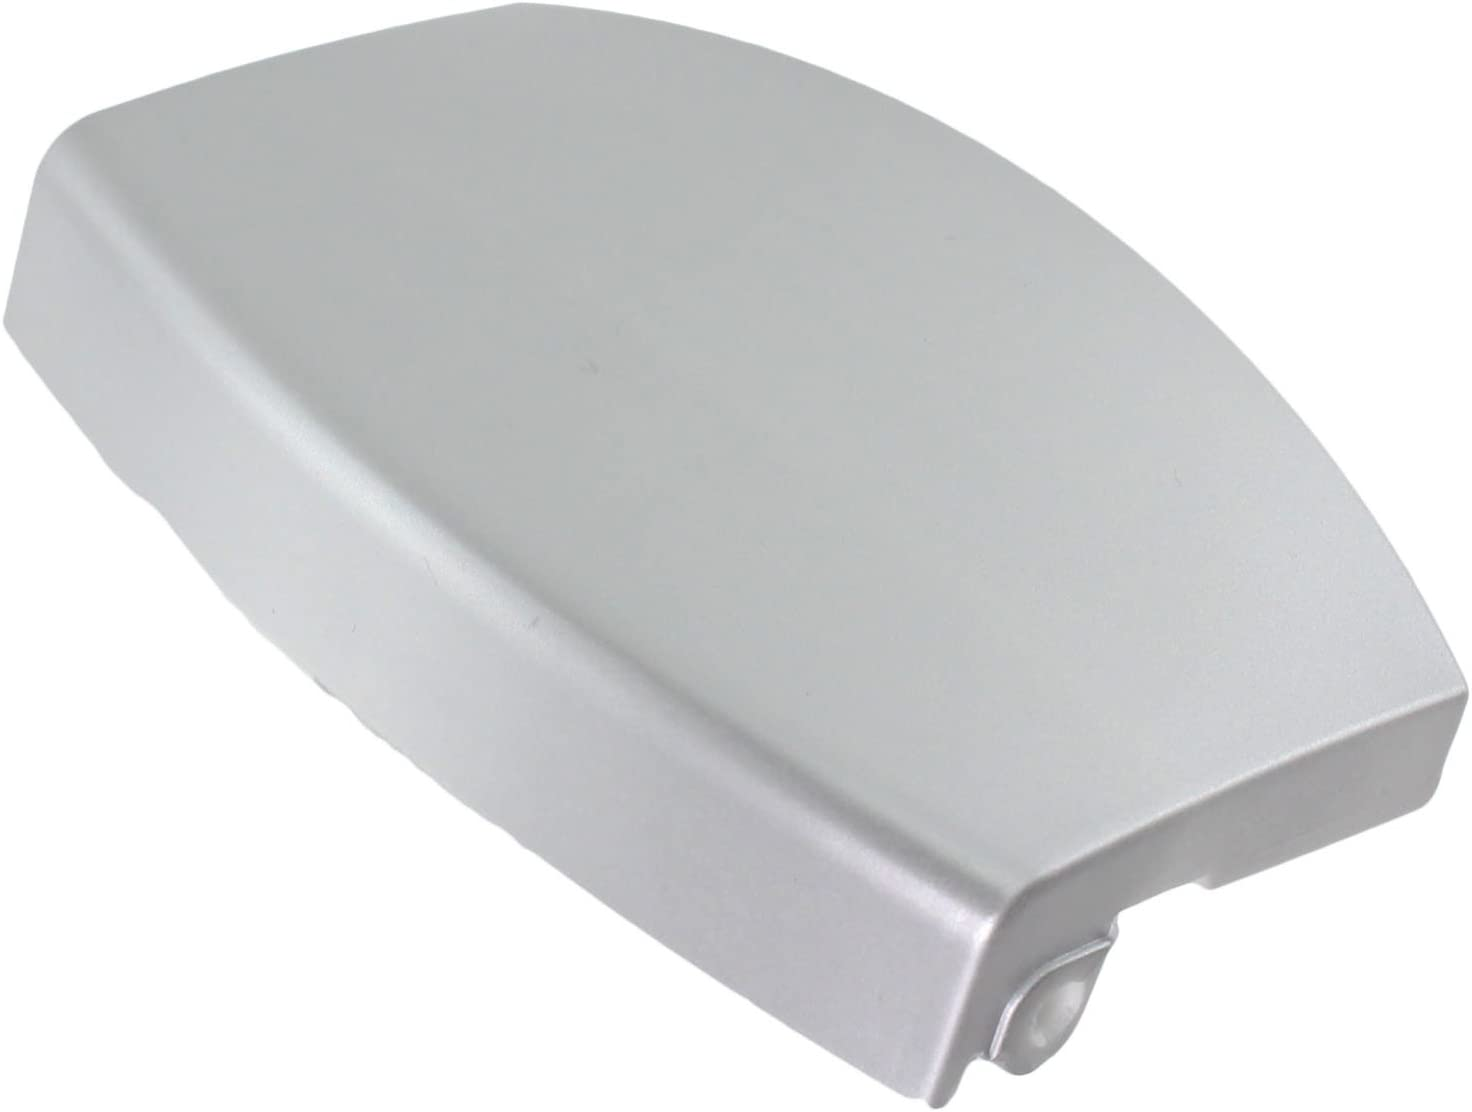 Spares2go plástico–Manilla de puerta para Aeg lavadoras (plata)